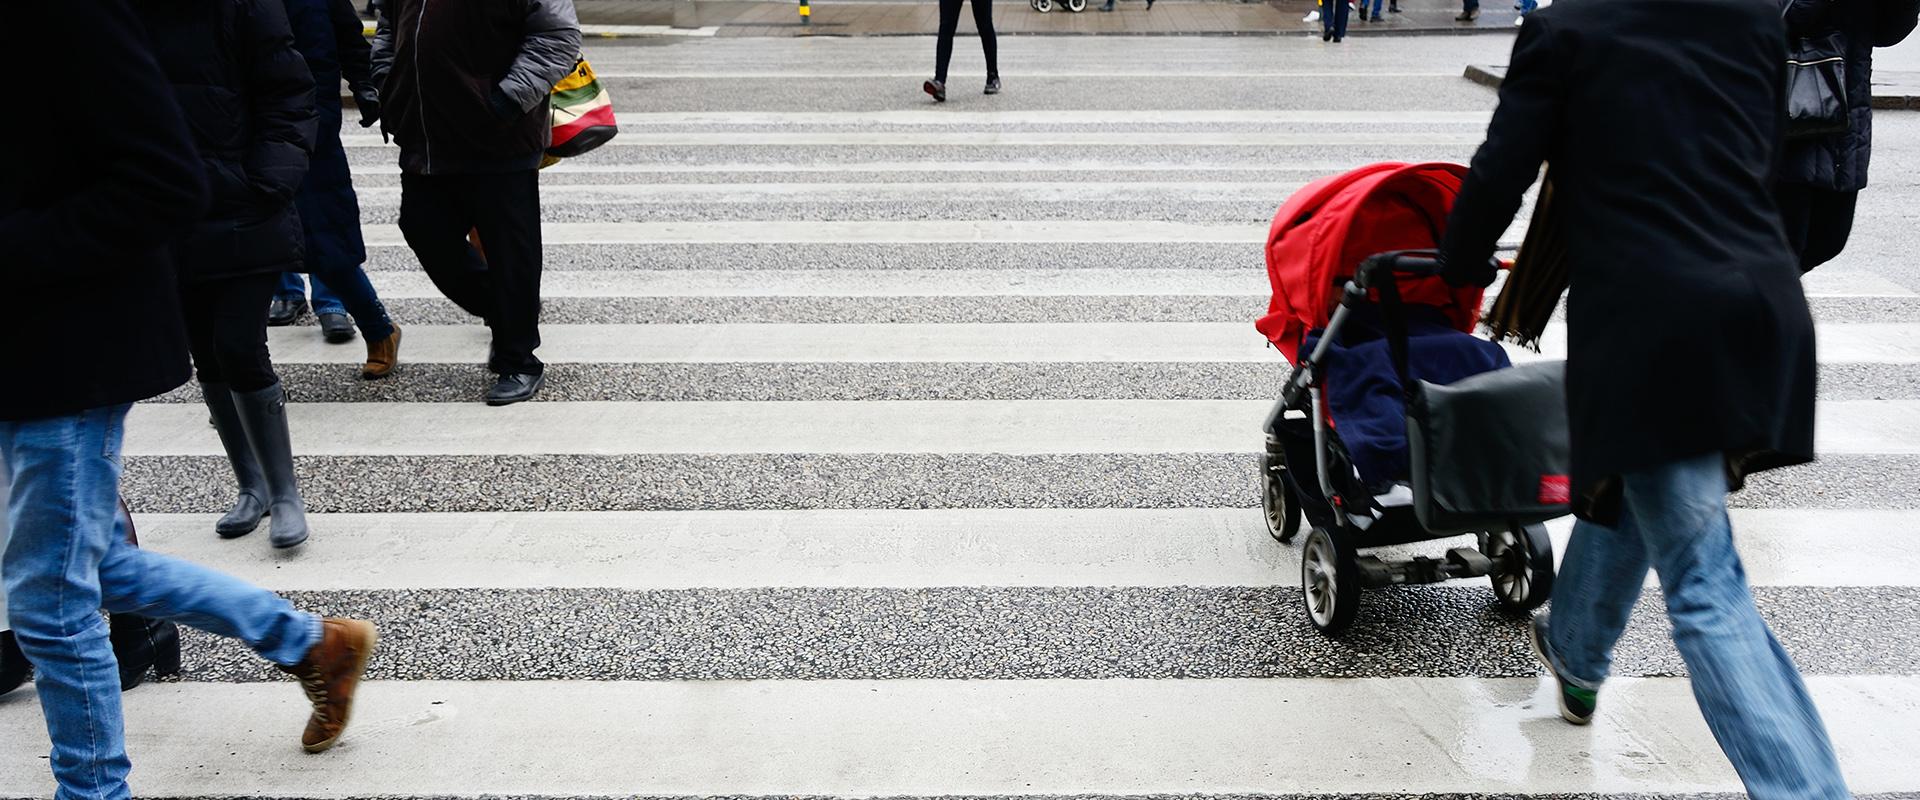 A toxic choking hazard for babies